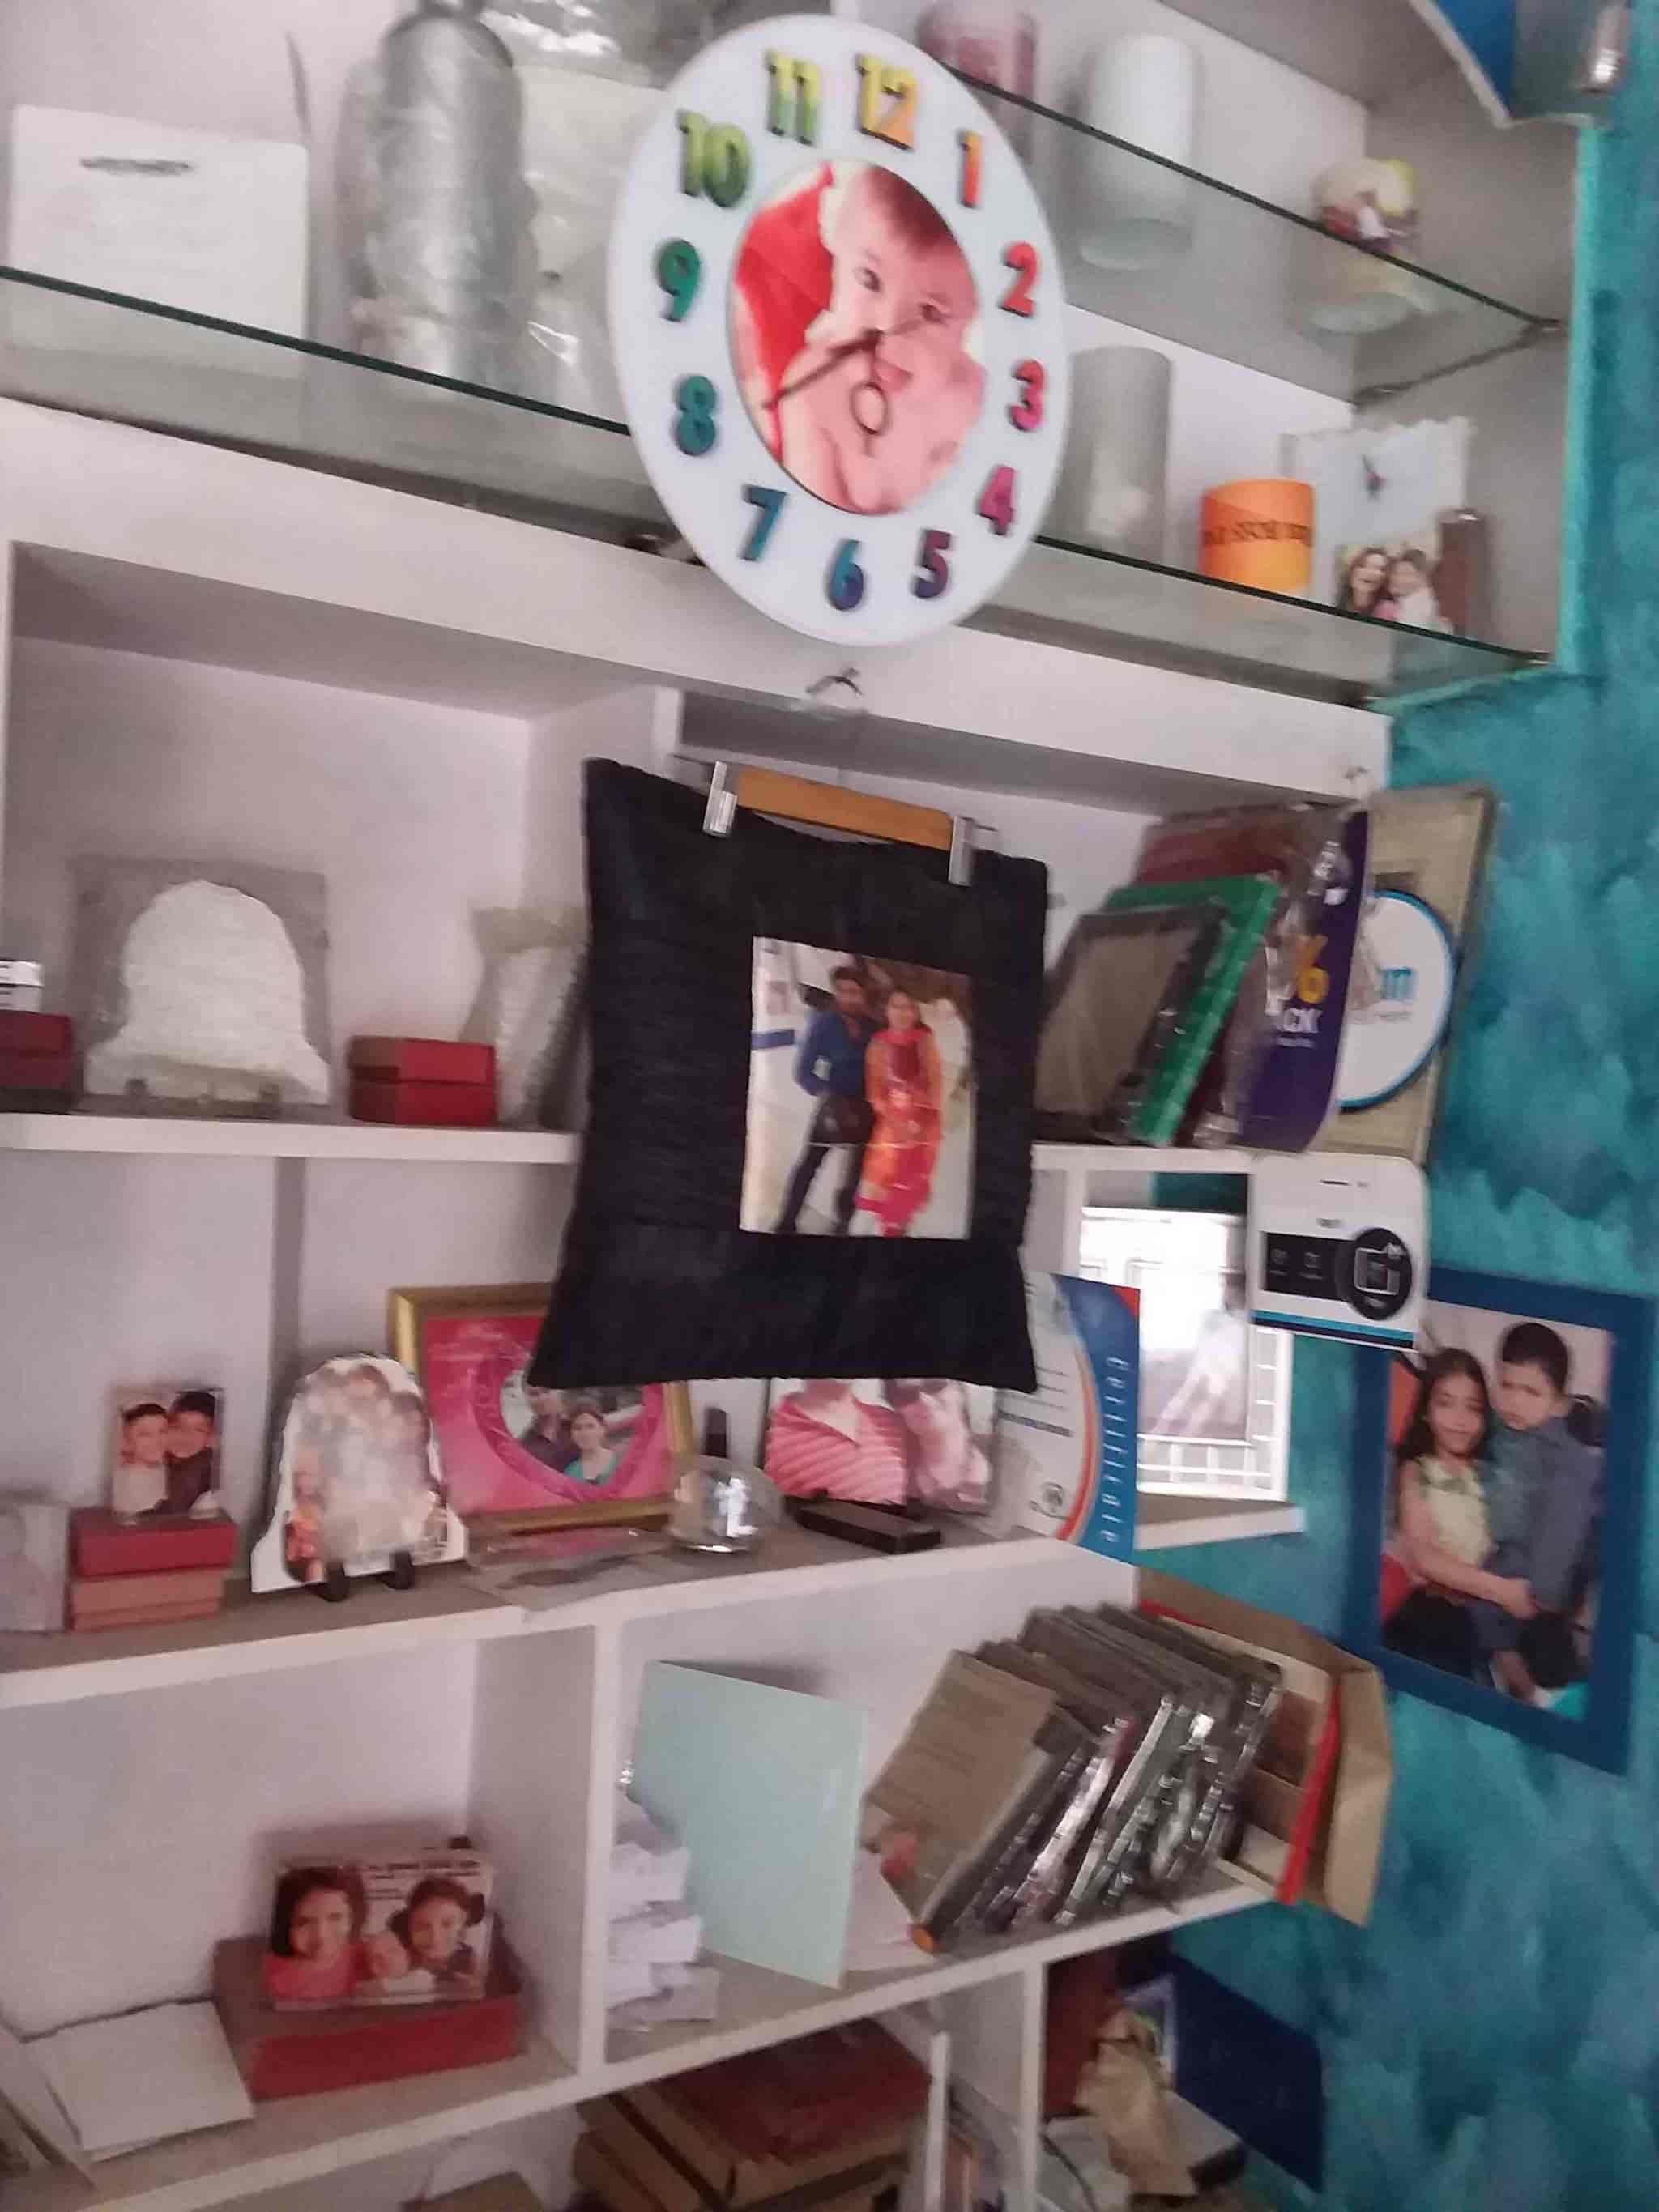 wedding card printers in bangalore indiranagar%0A R S Digital Studio  Indiranagar  Photo Studios in Bangalore  Justdial